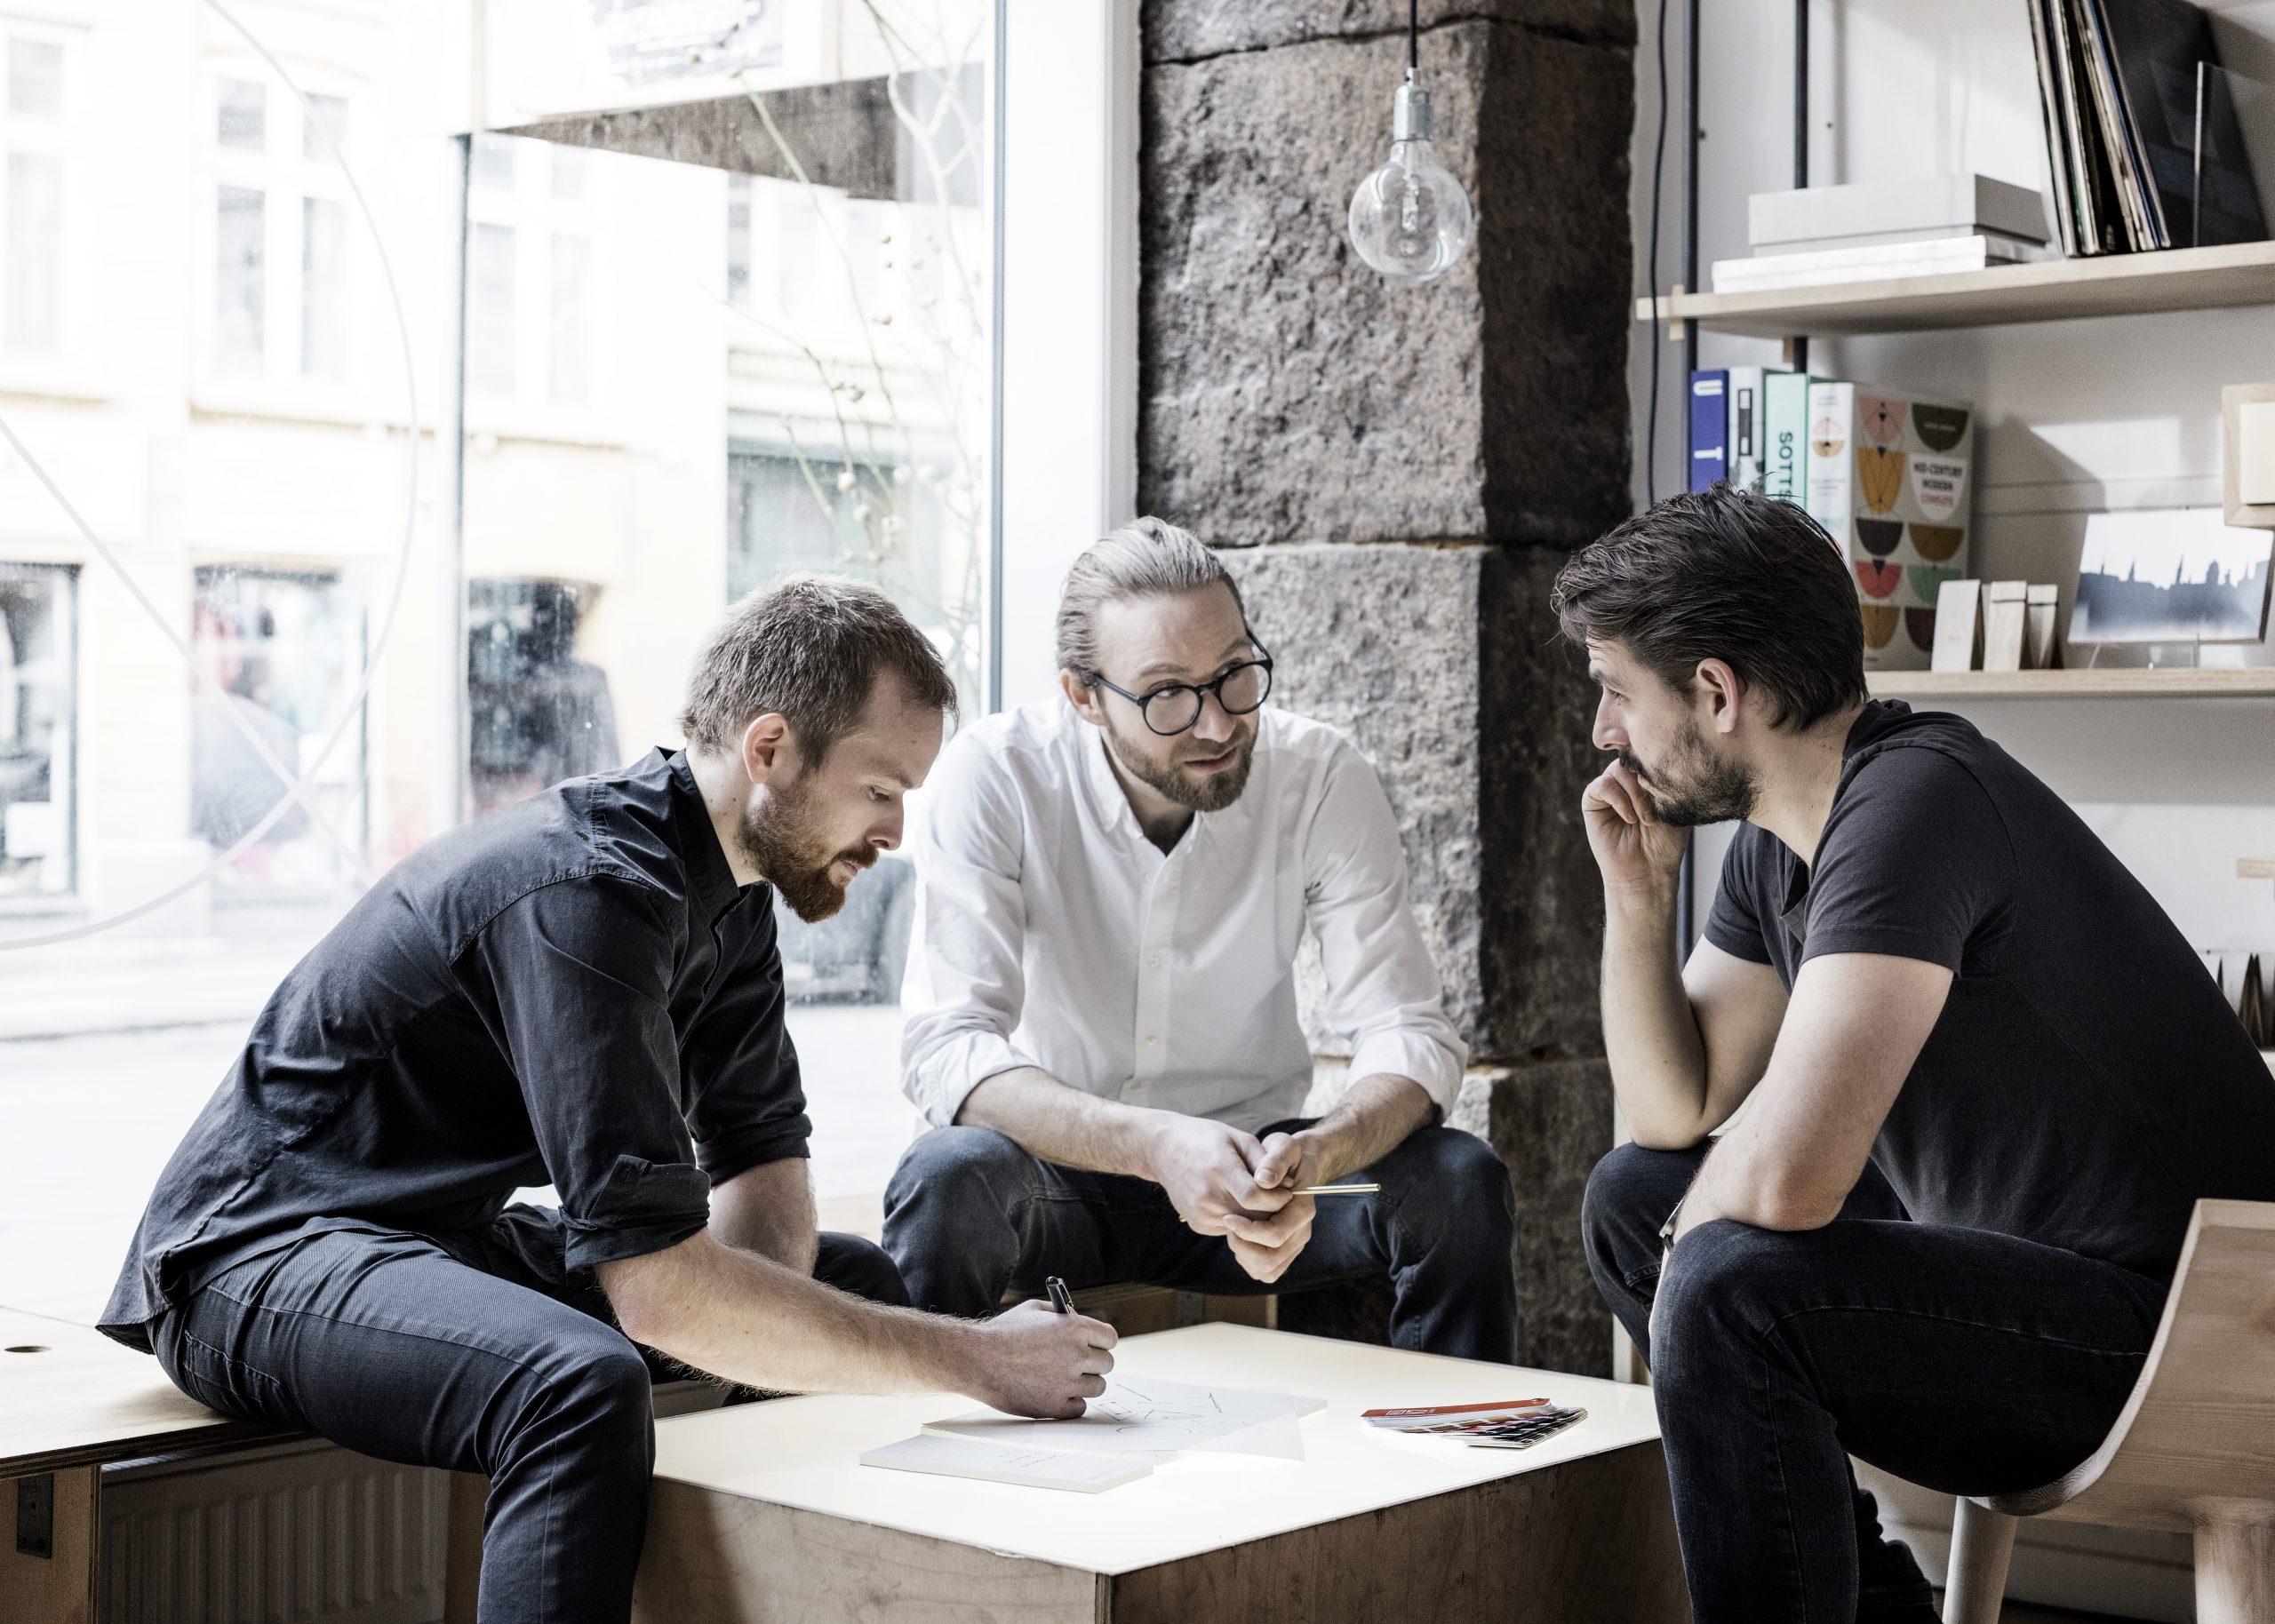 Anders Thams, Nicholas Oldroyd & Martin D. Christensen